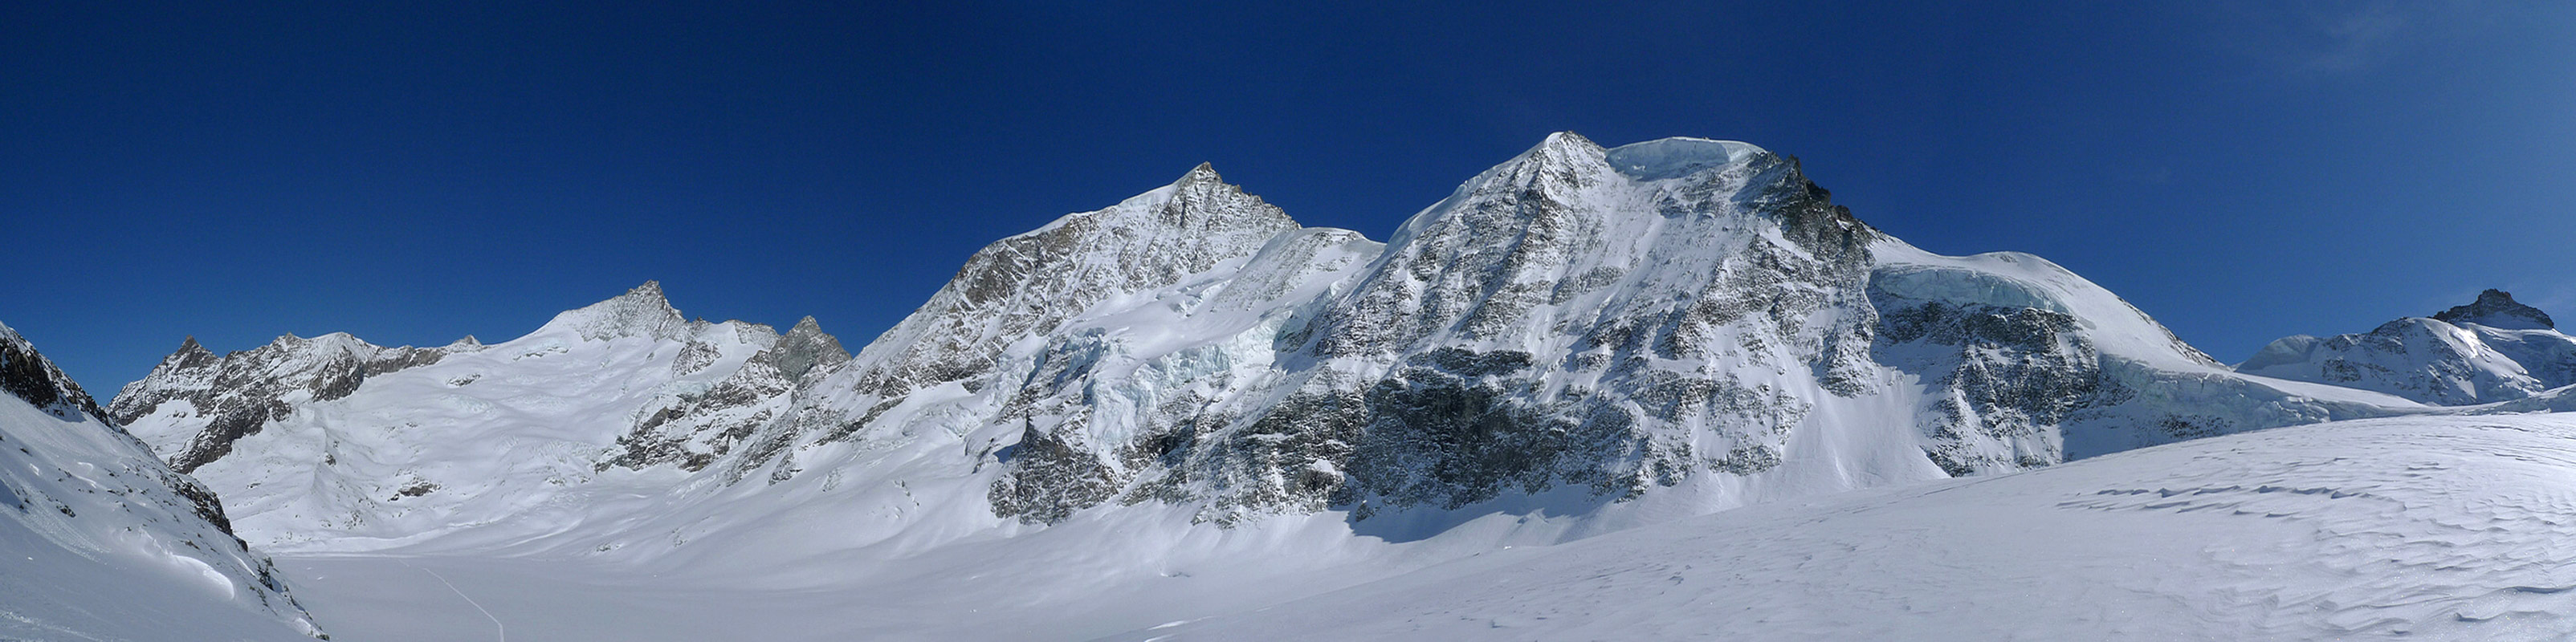 Mont Durand / Arbenhorn Walliser Alpen / Alpes valaisannes Switzerland panorama 46